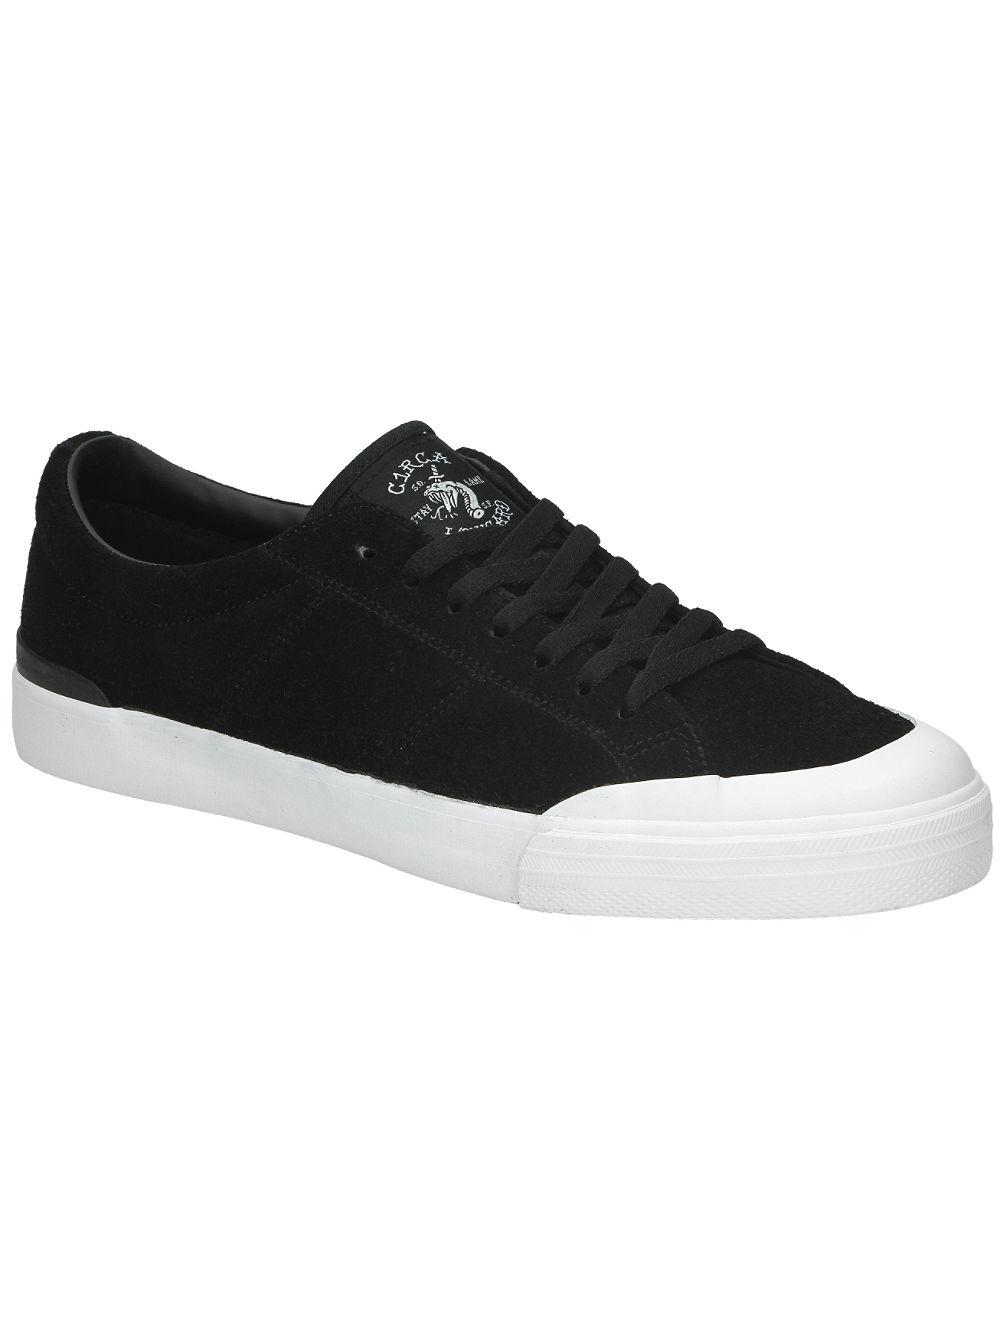 circa-fremont-lowcard-c1rca-skate-shoes